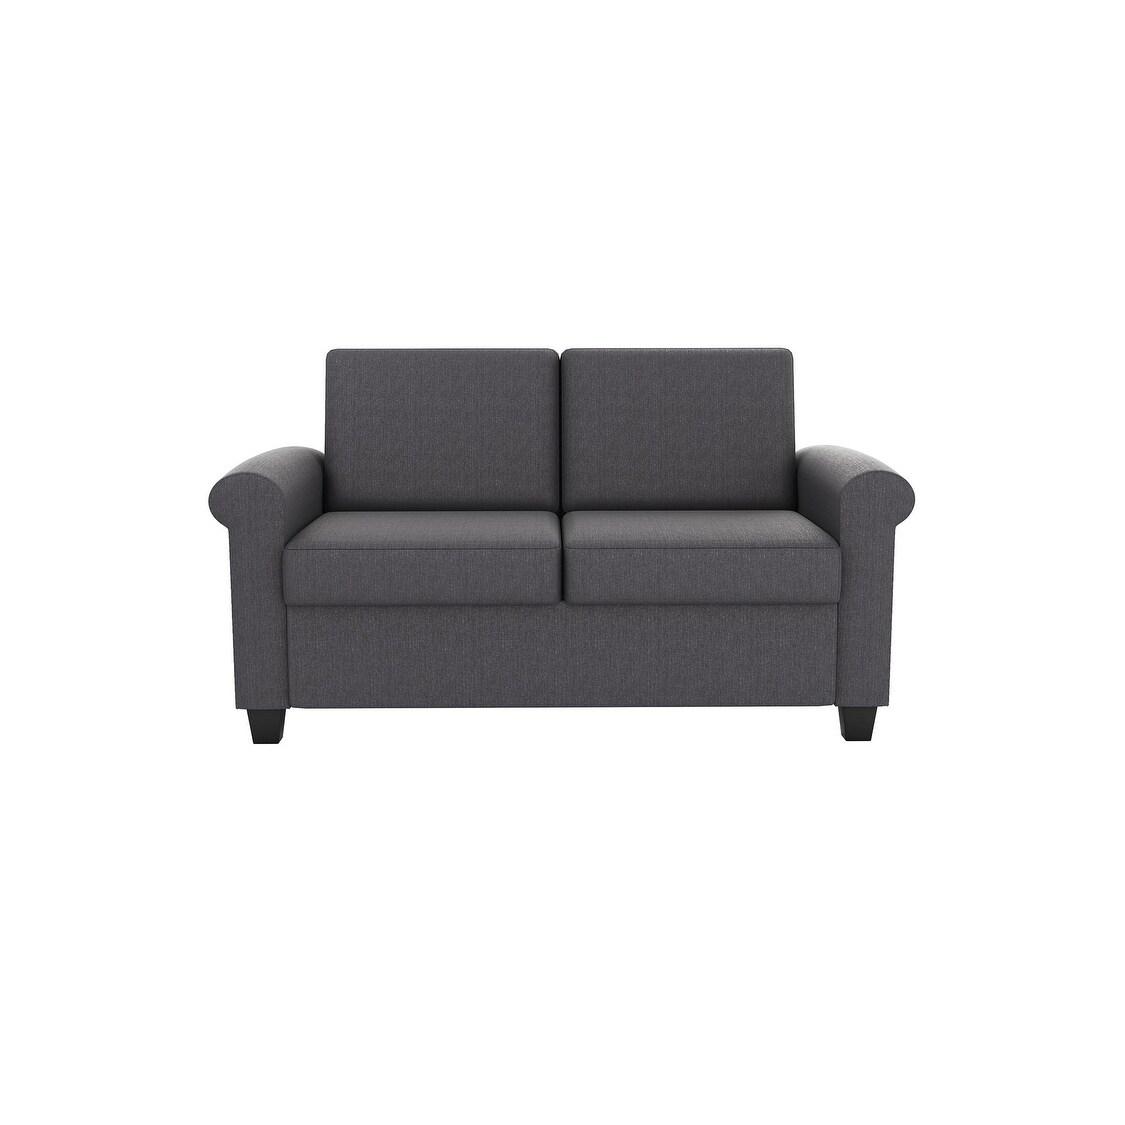 Dhp Logan Grey Linen Sleeper Sofa On Free Shipping Today 20717521